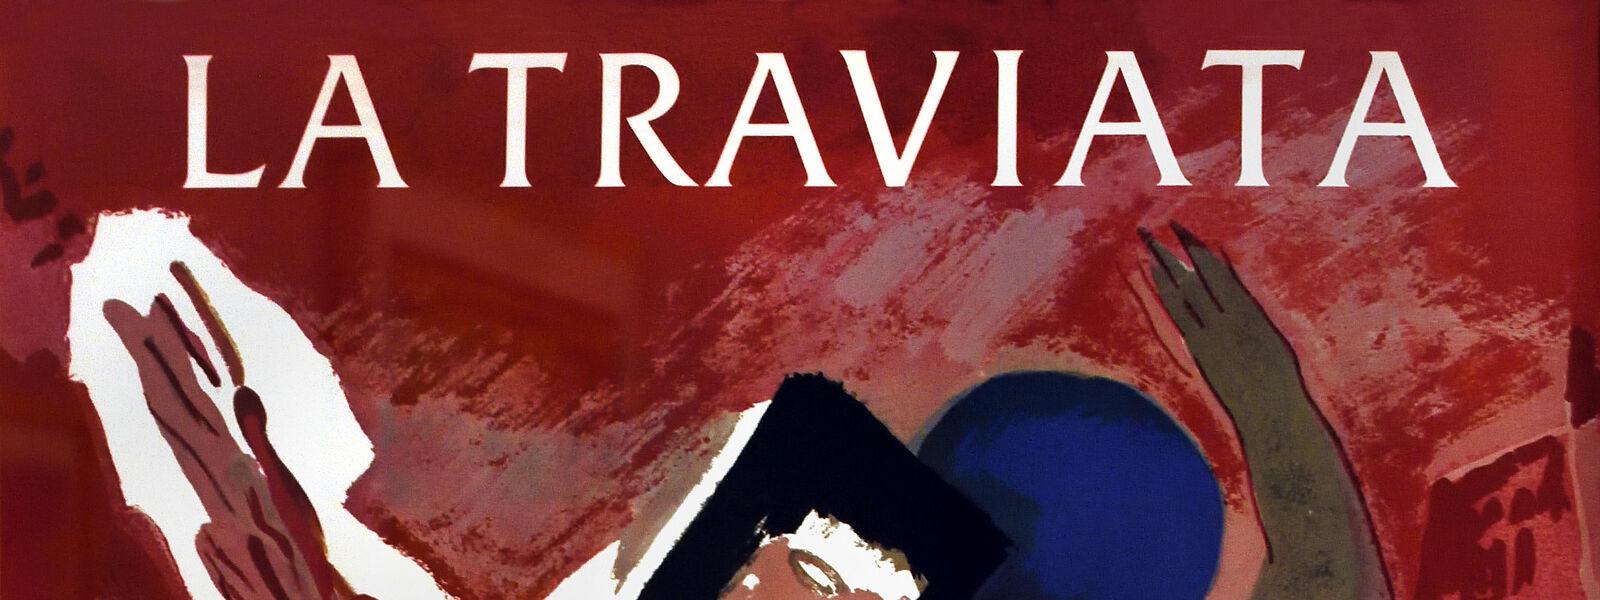 BigliettiLa Traviata Venezia